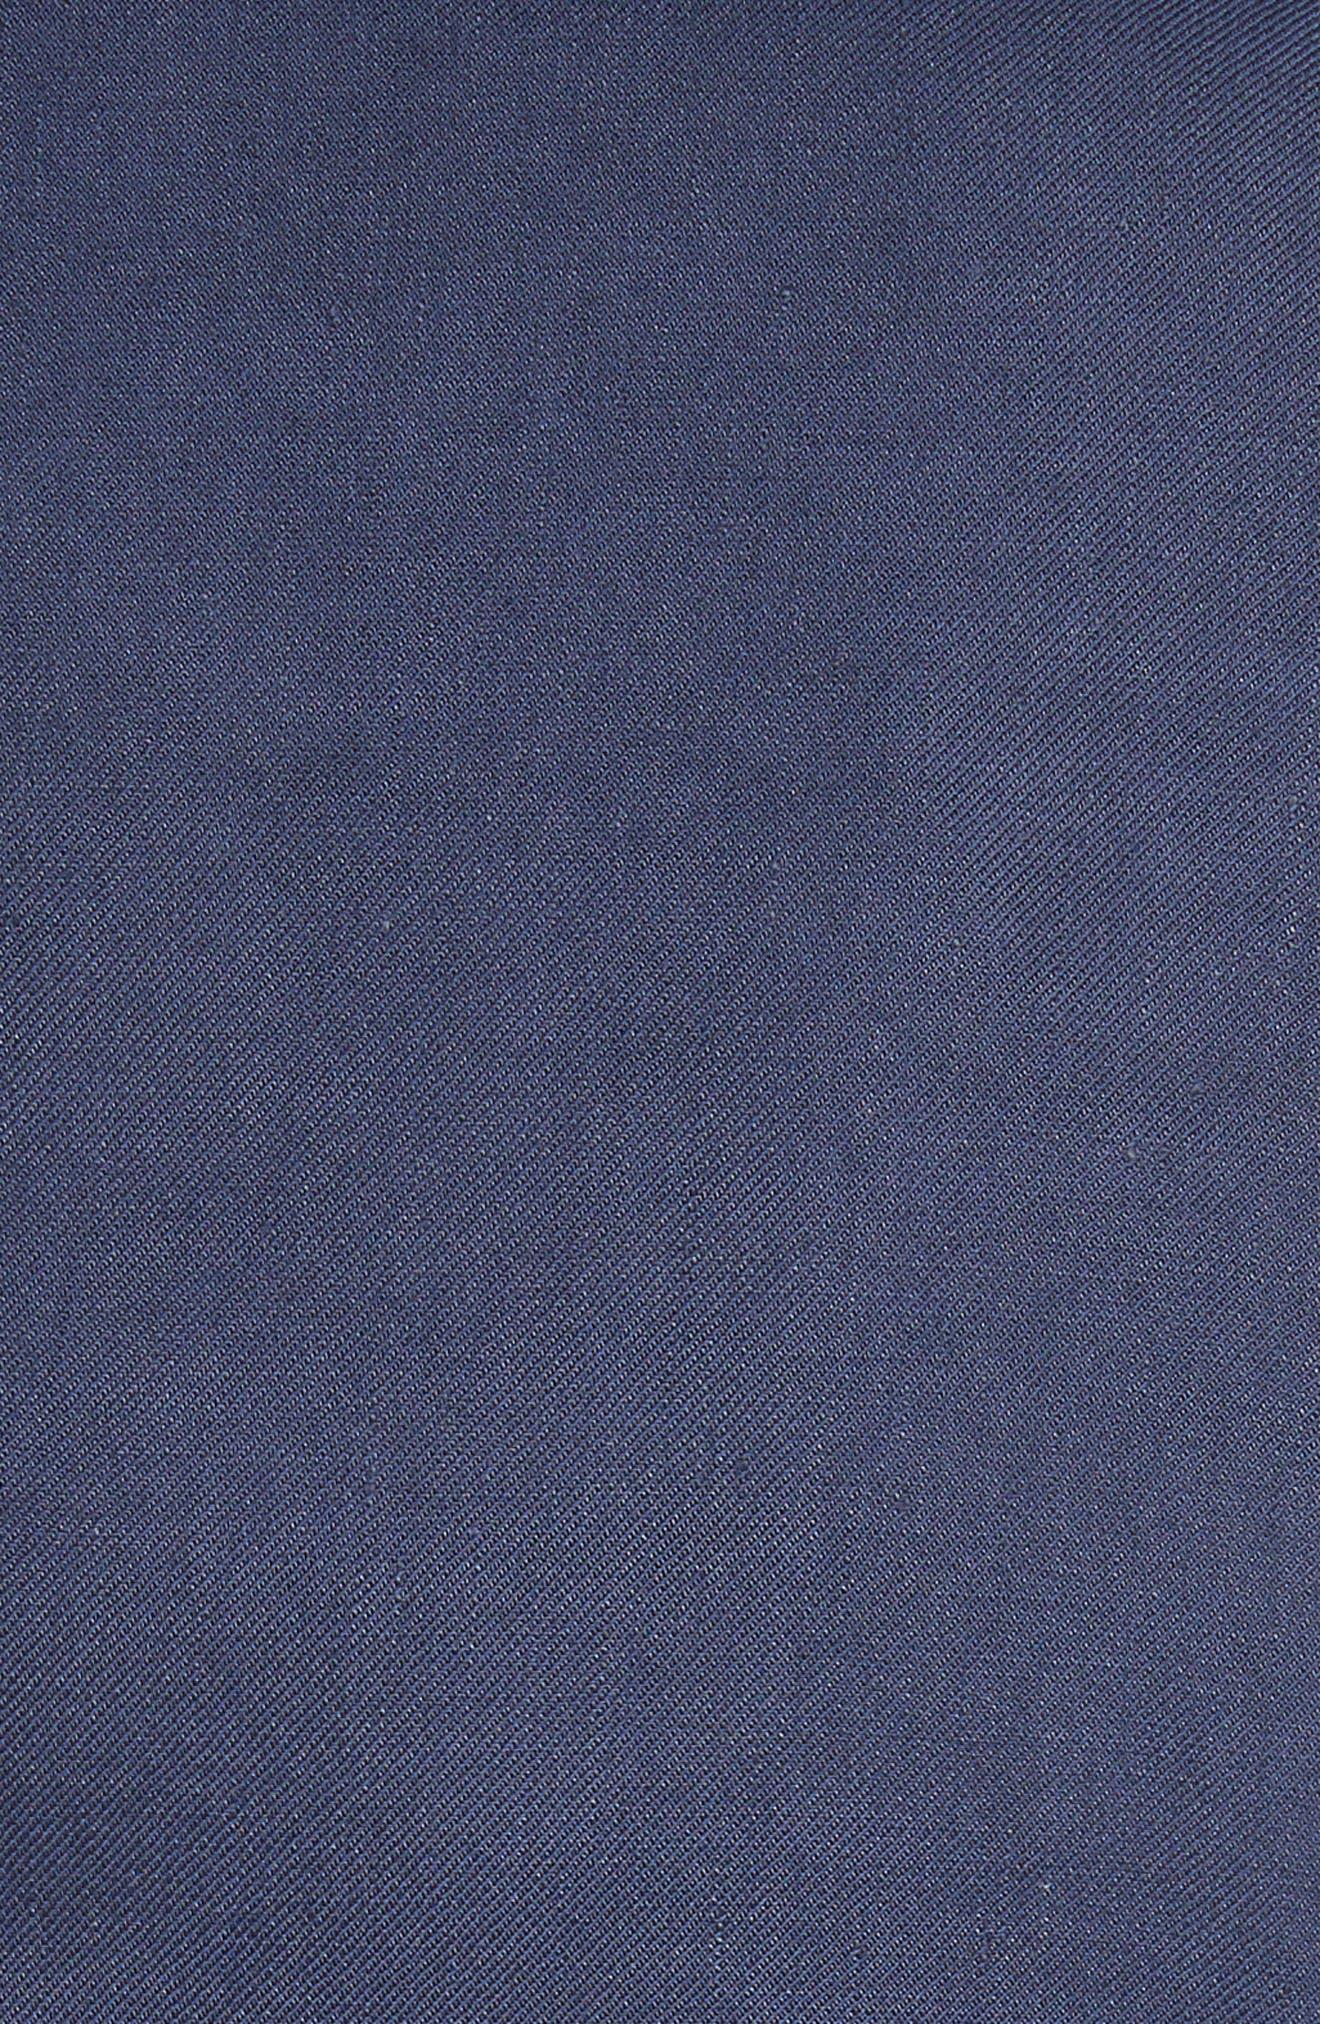 Piped Linen & Cotton Blend Blazer,                             Alternate thumbnail 6, color,